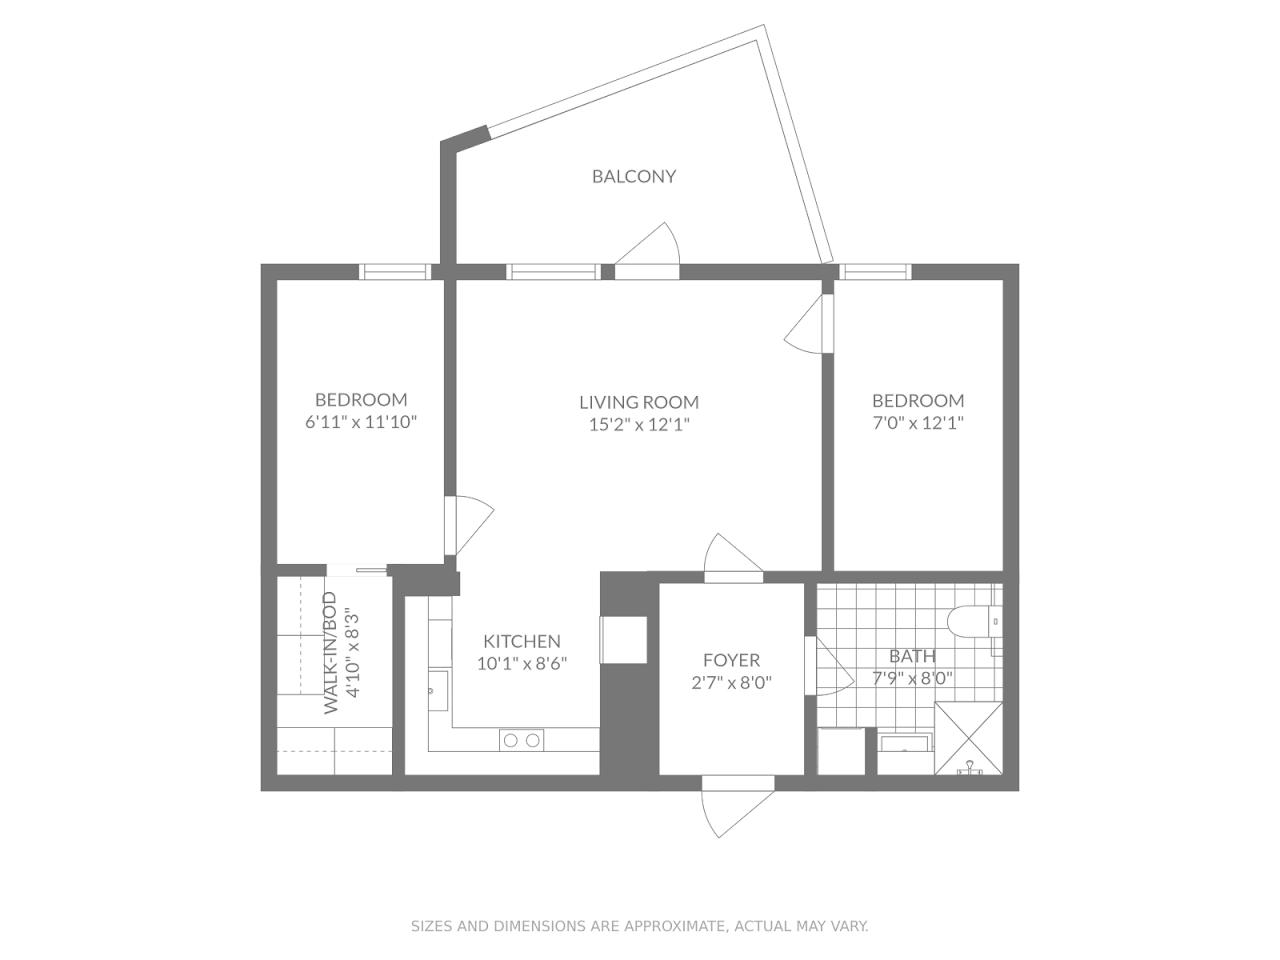 Floor plan theme: Elegant